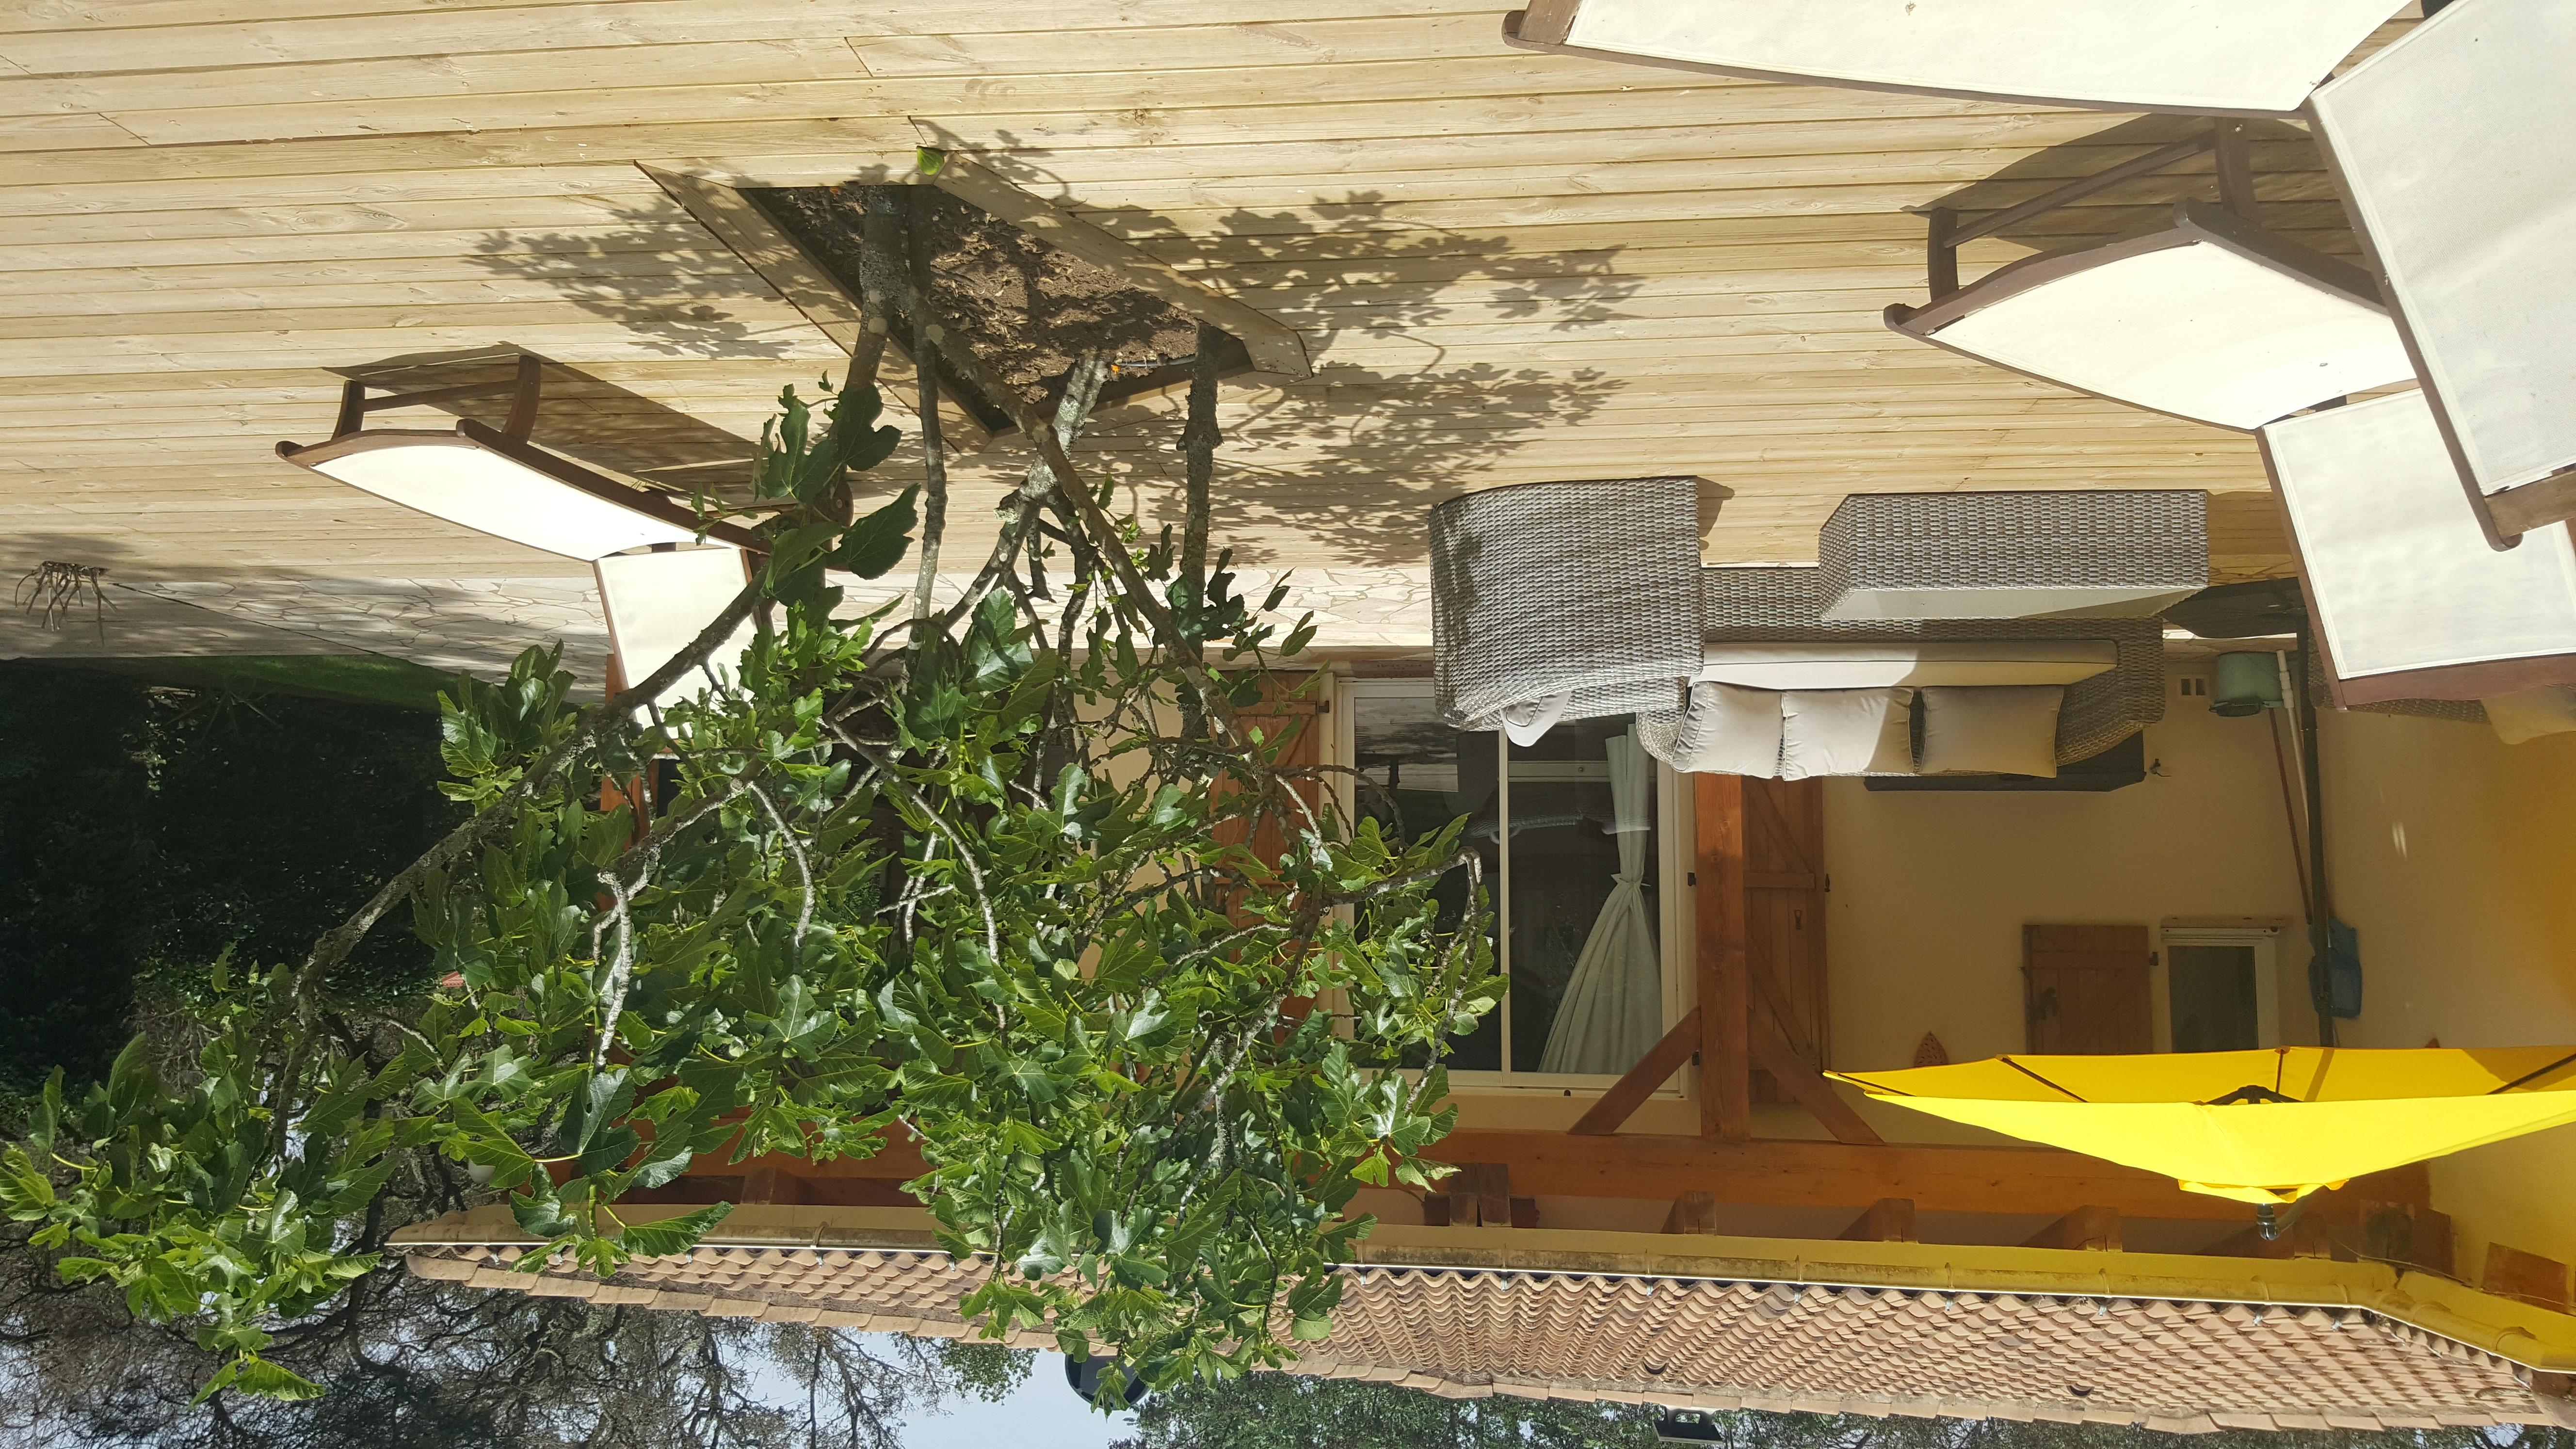 Ferienhaus korsika, beheizter Pool